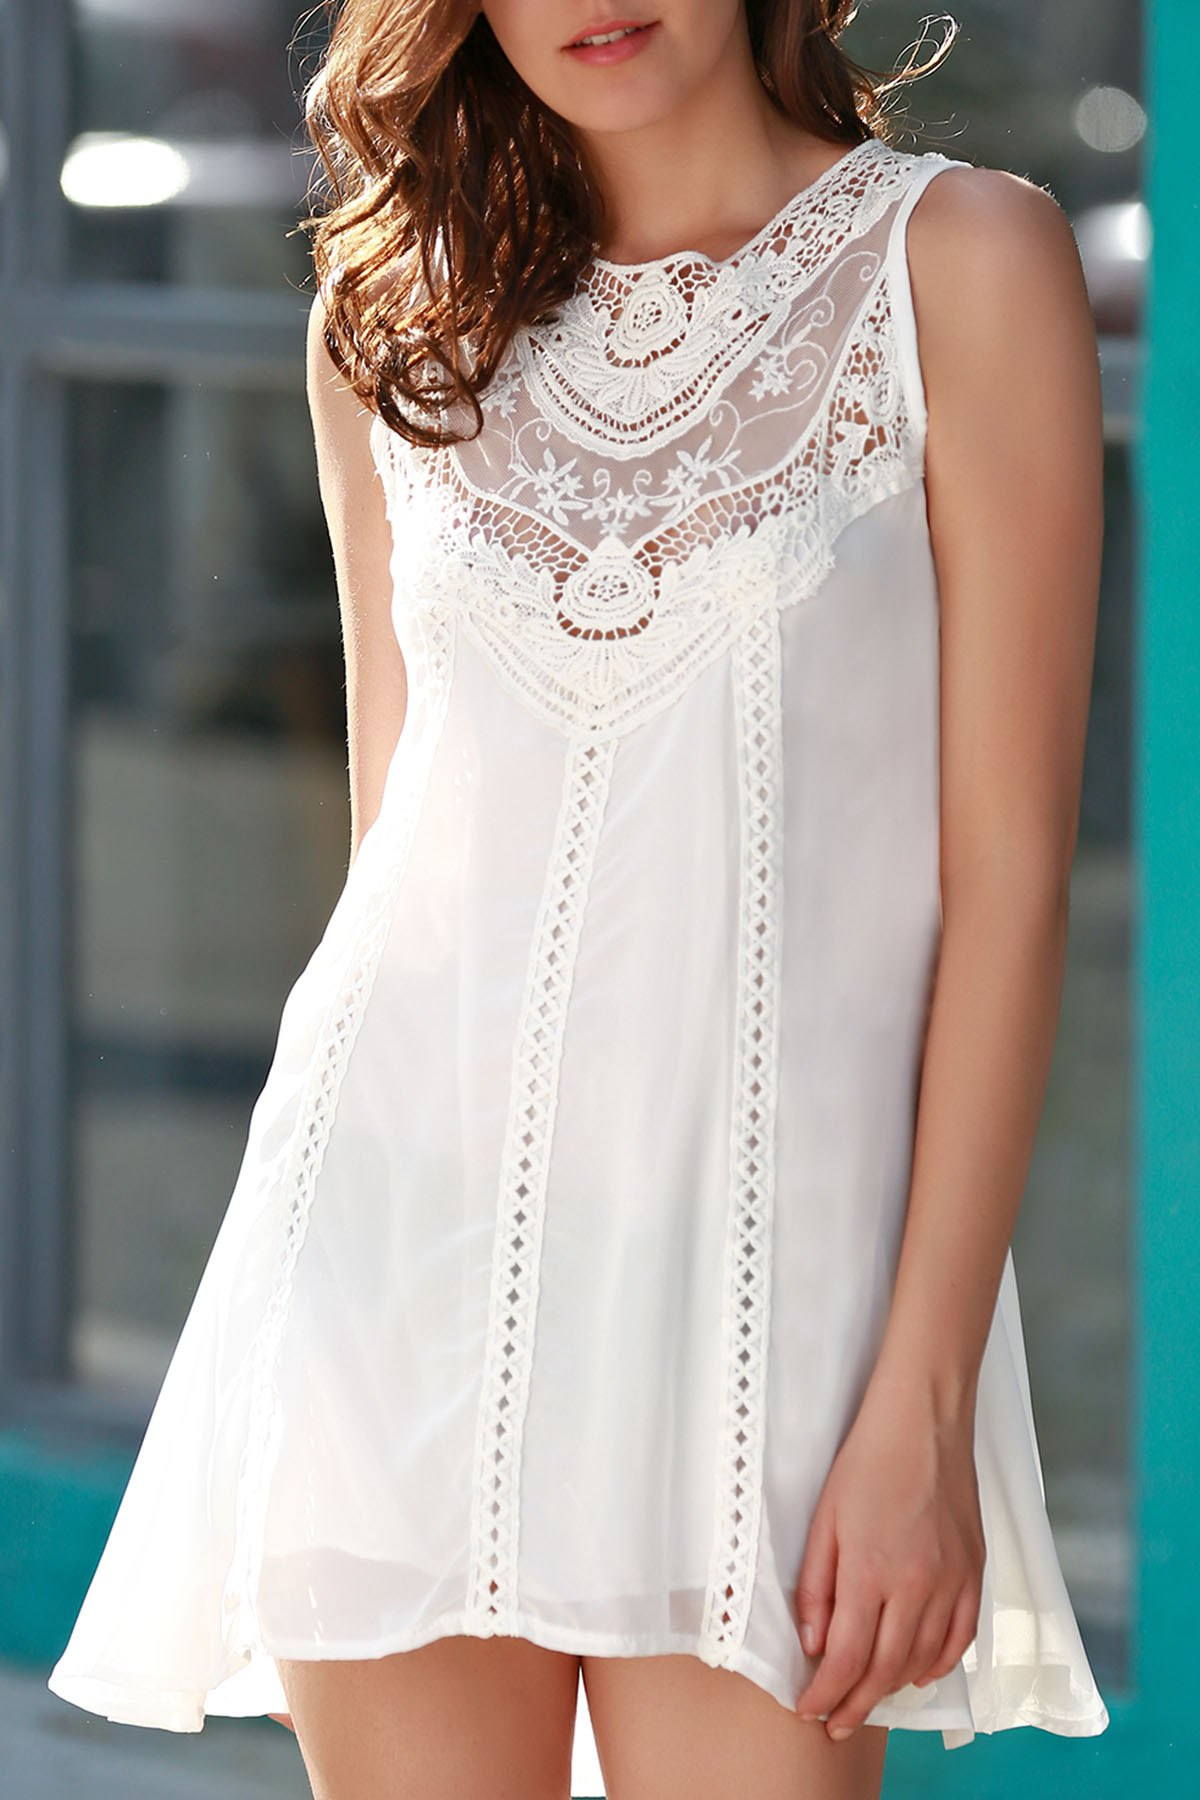 Jewel Neck Sleeveless Spliced Openwork White Chiffon Dress